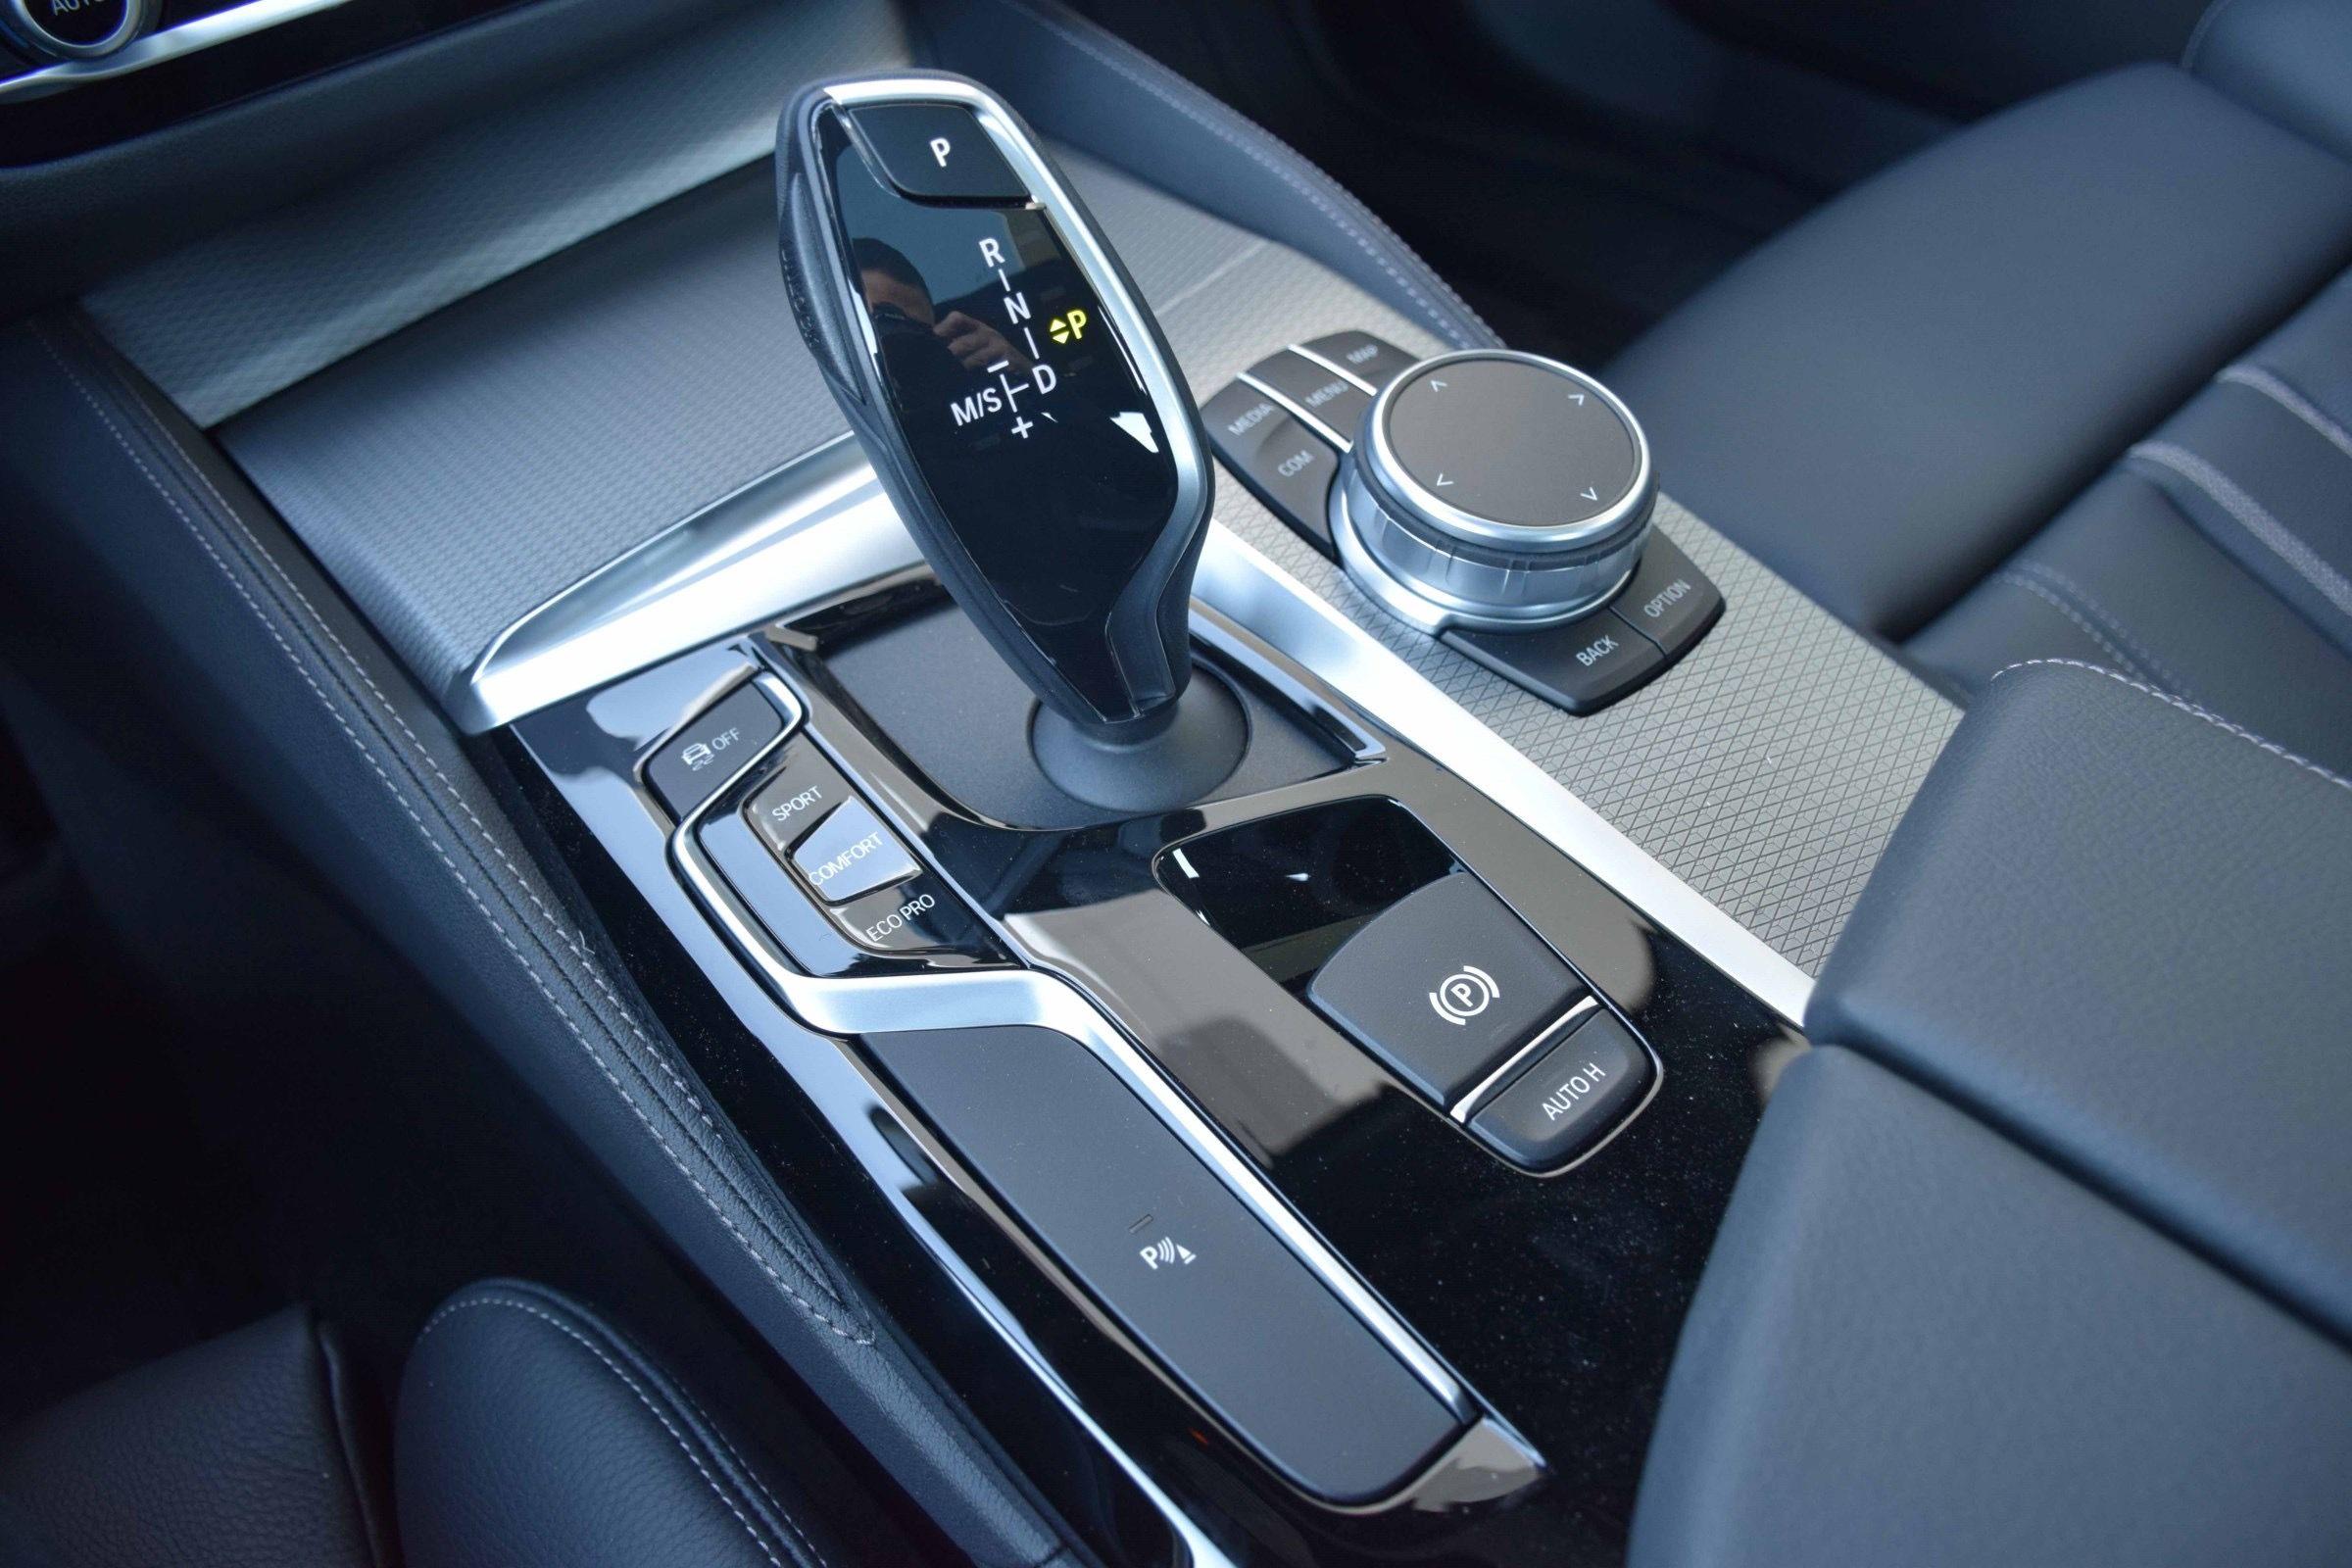 2020 BMW 5-Series 530i - INFOCAR - Toronto's Most Comprehensive New and Used Auto Trading Platform